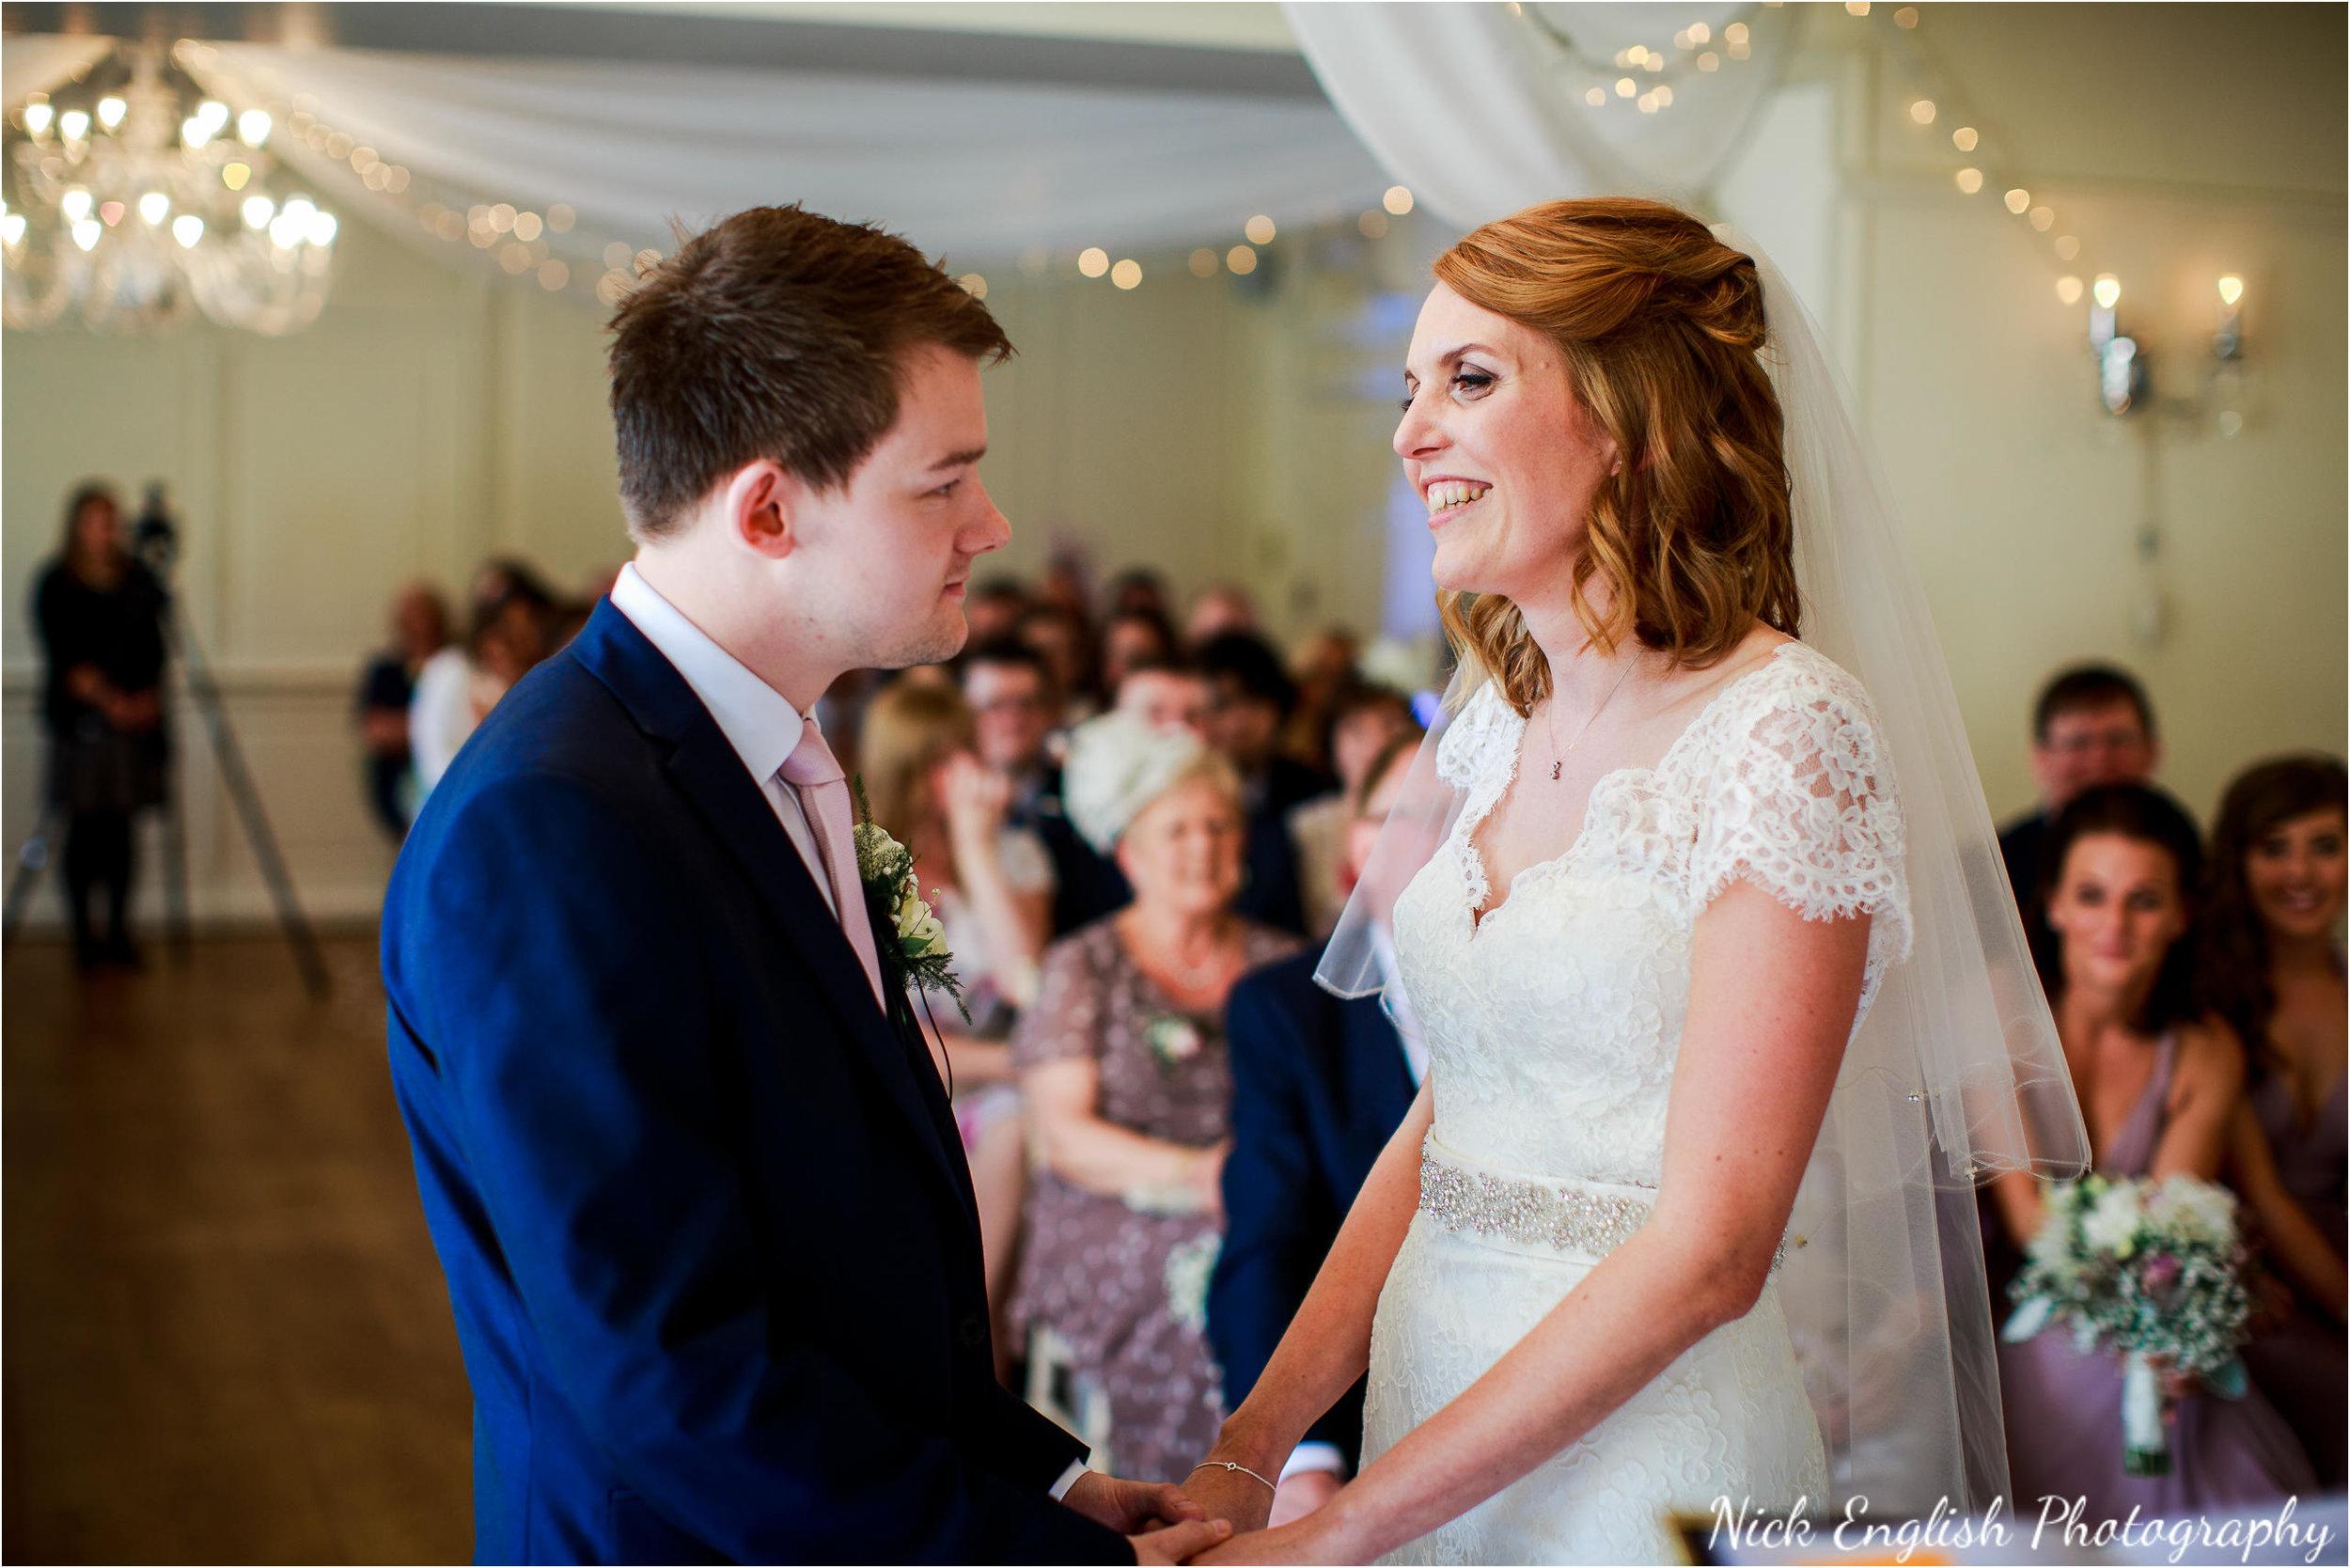 Alison James Wedding Photographs at Eaves Hall West Bradford 101jpg.jpeg